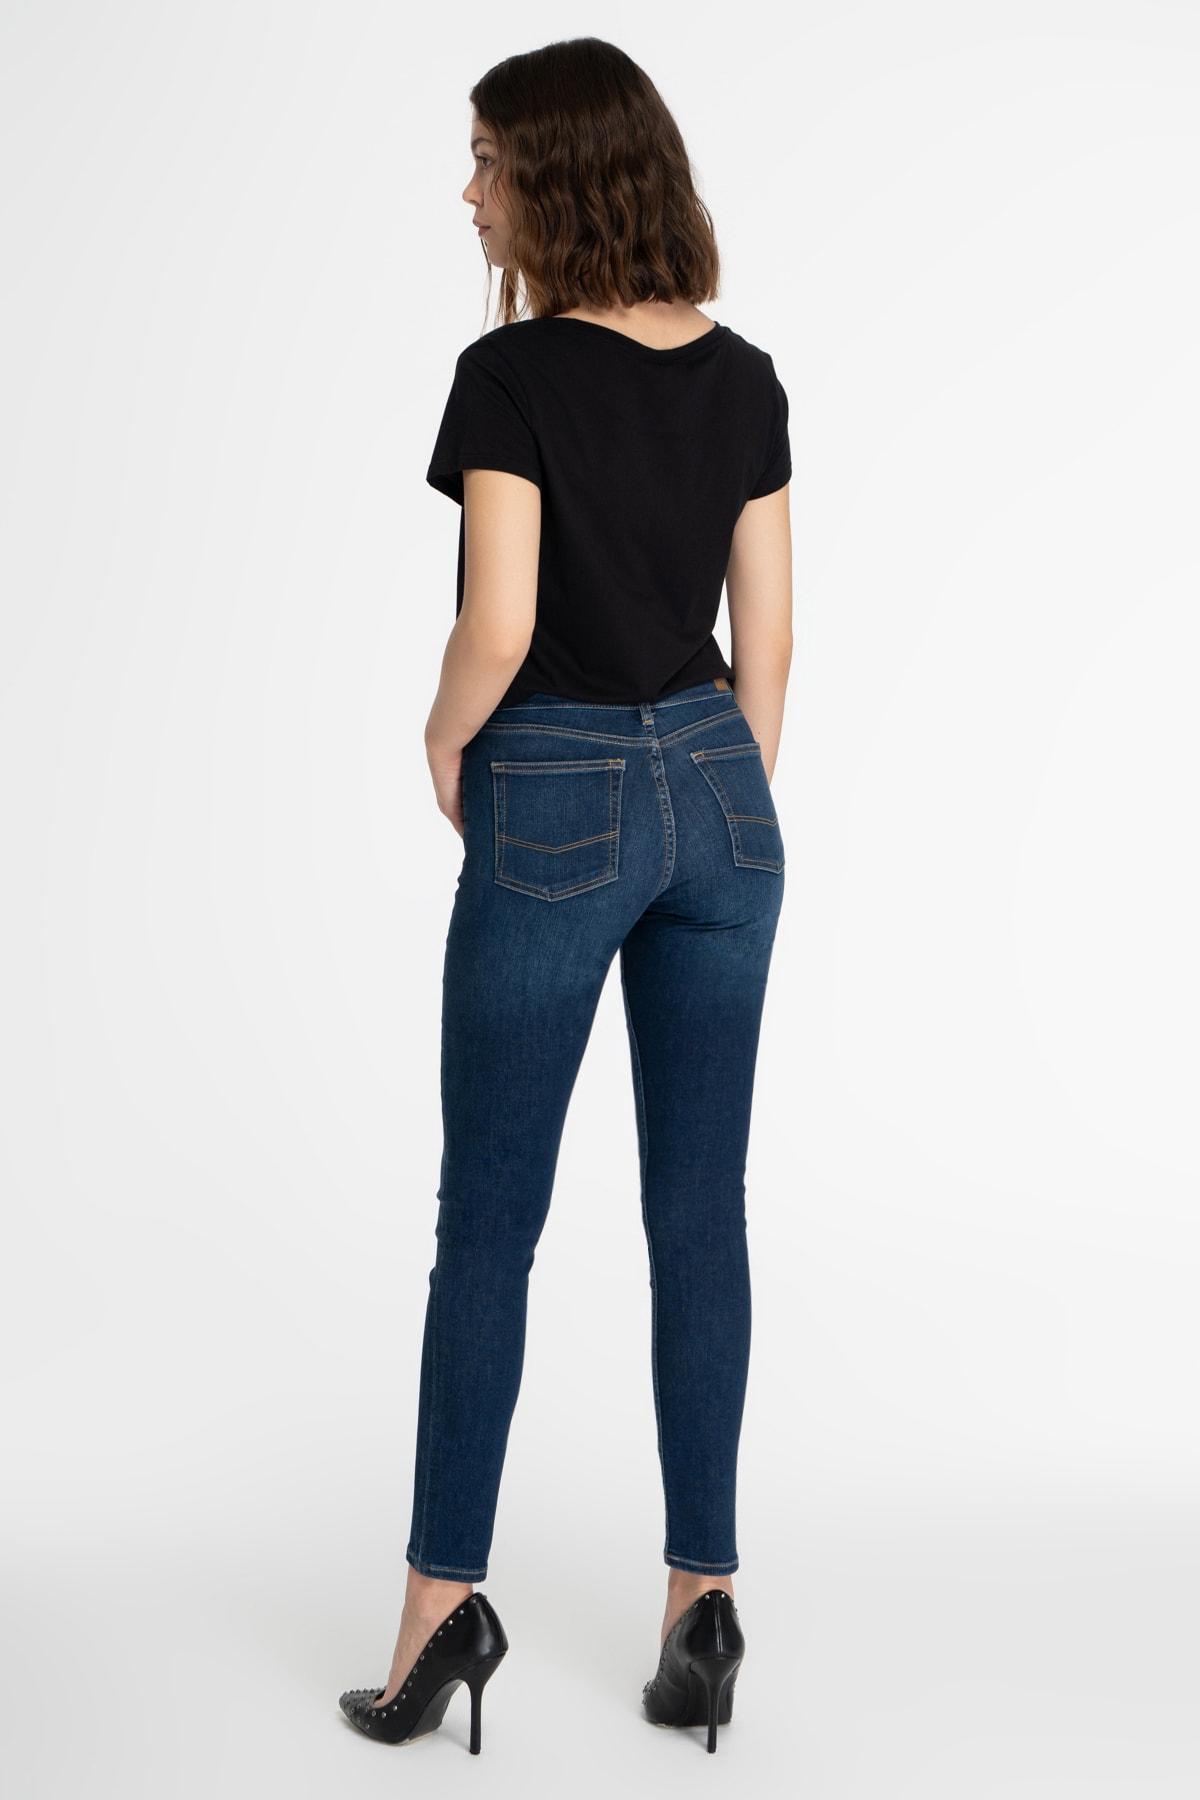 CROSS JEANS Kadın Koyu Mavi Normal Bel Skinny Fit Jean Pantolon 2